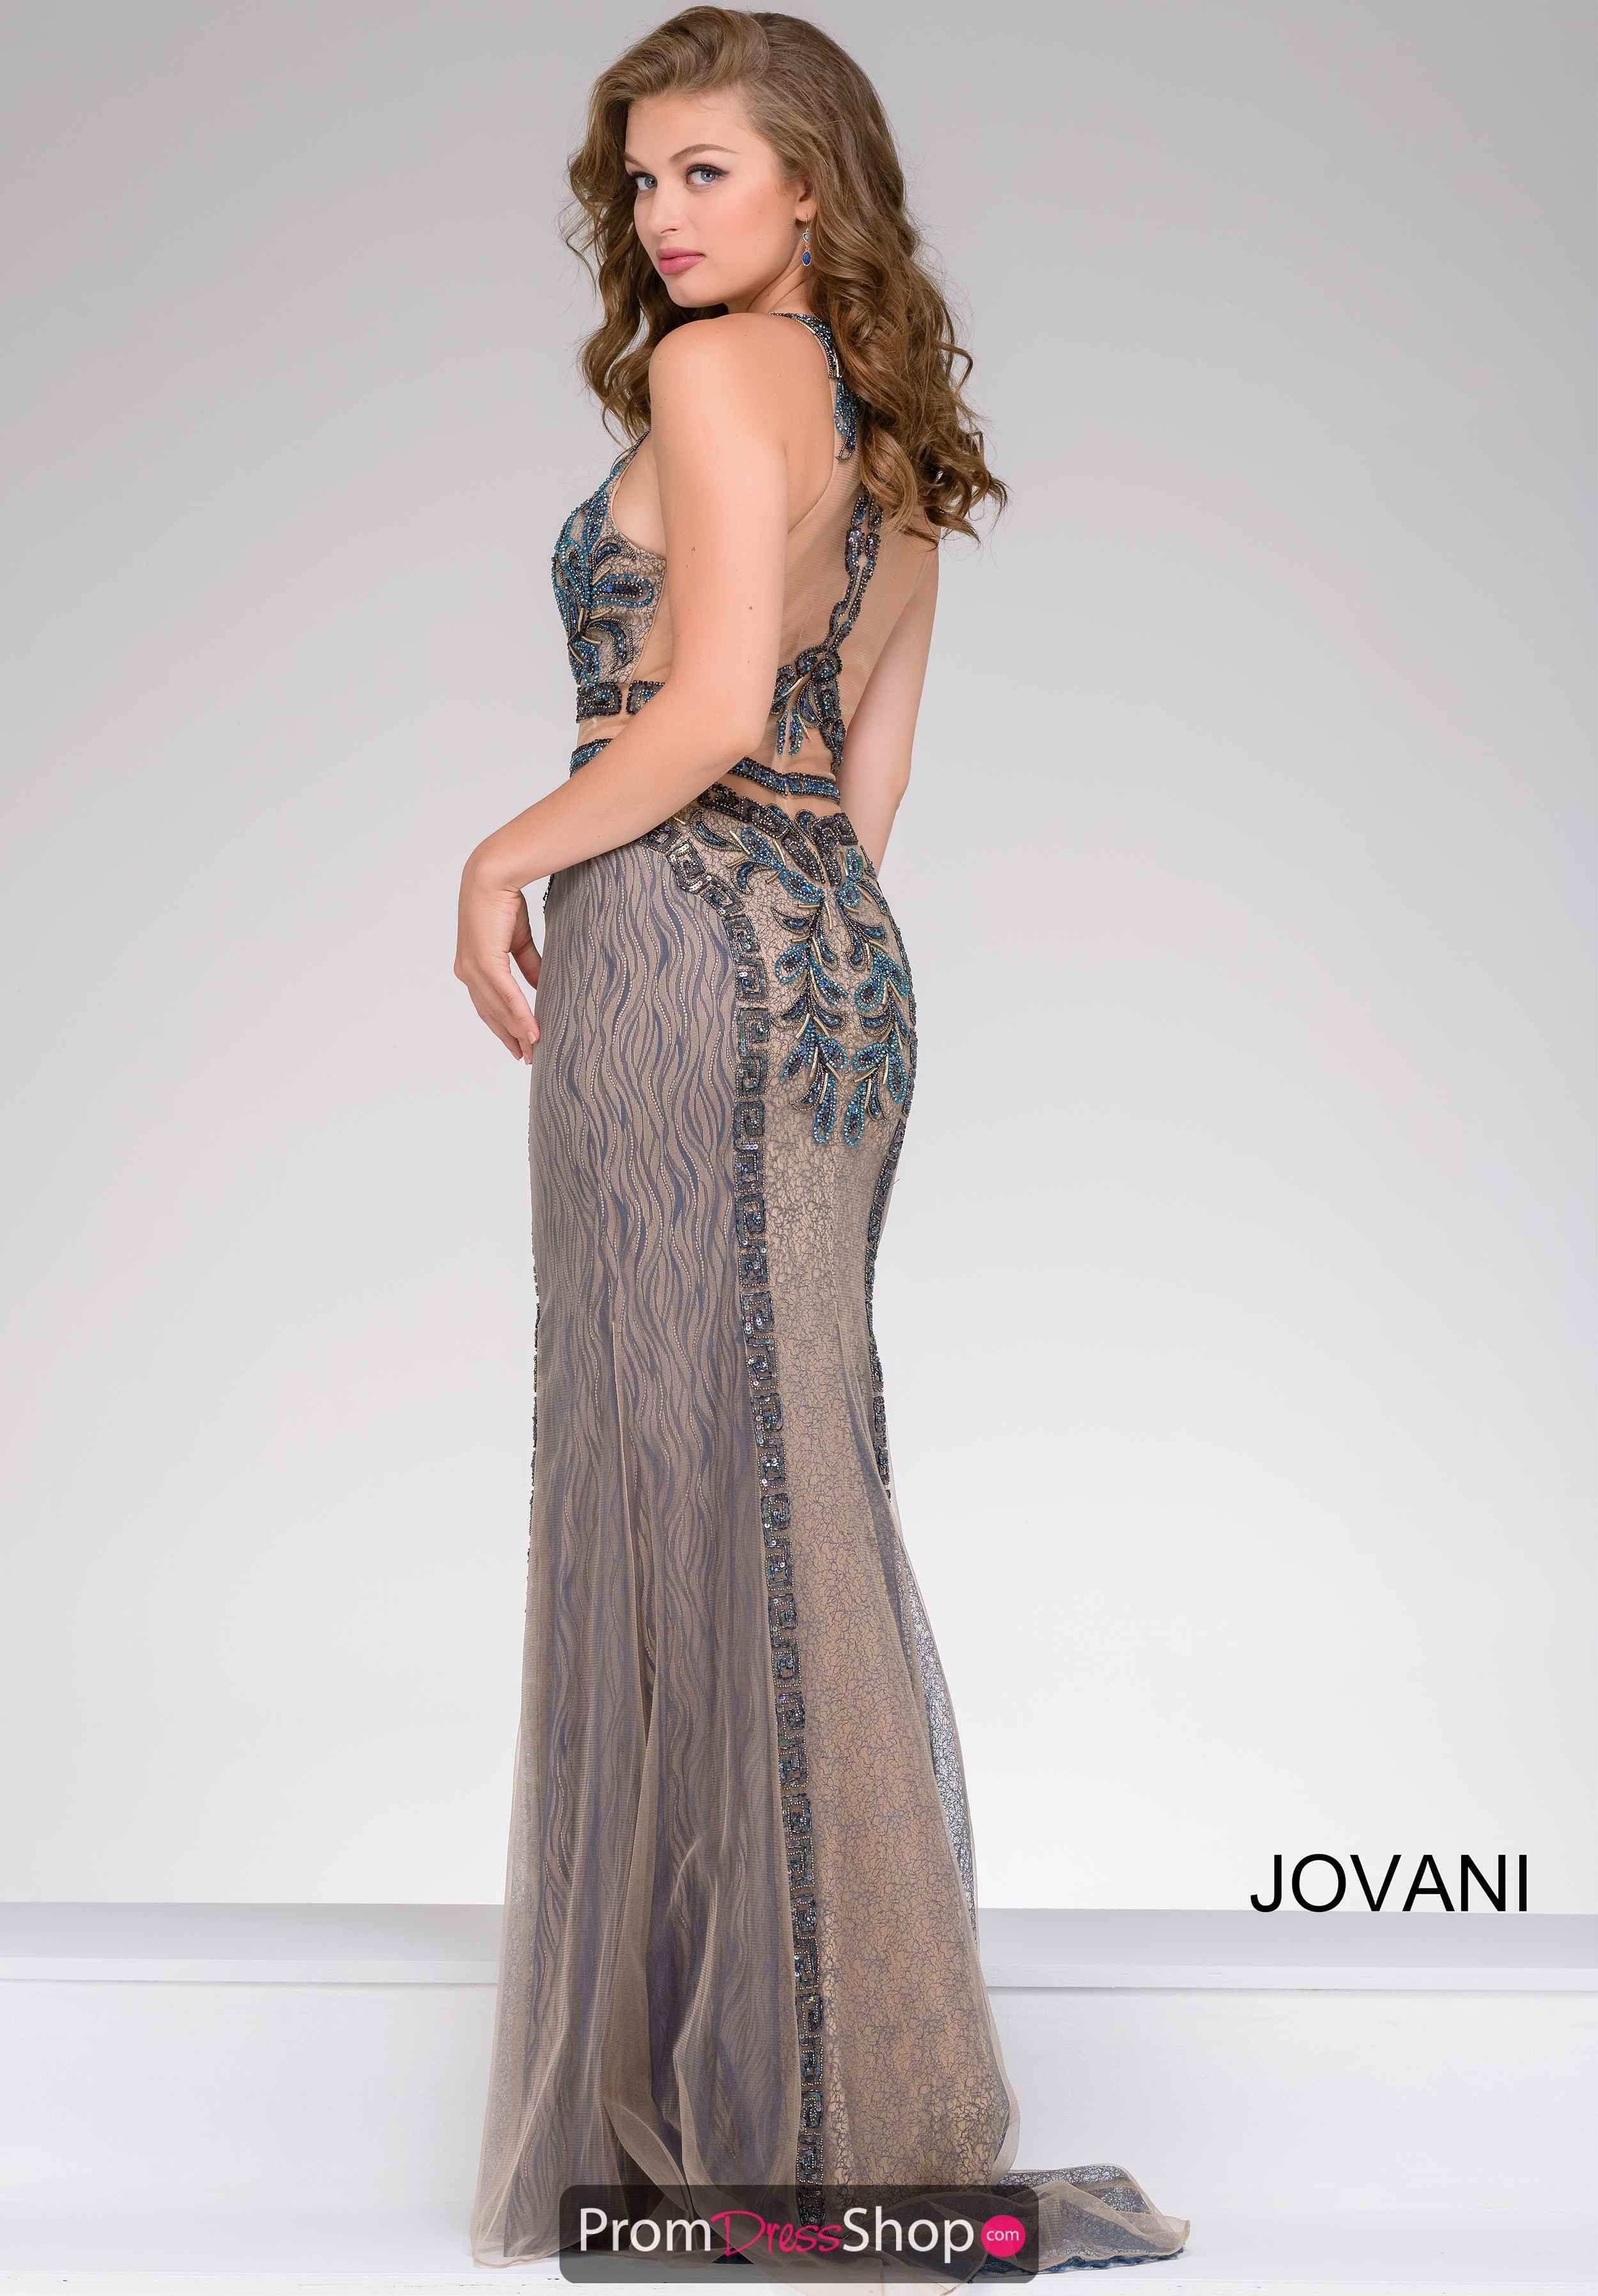 81b7e8b3ead Jovani Evening Dresses 2019 - Gomes Weine AG